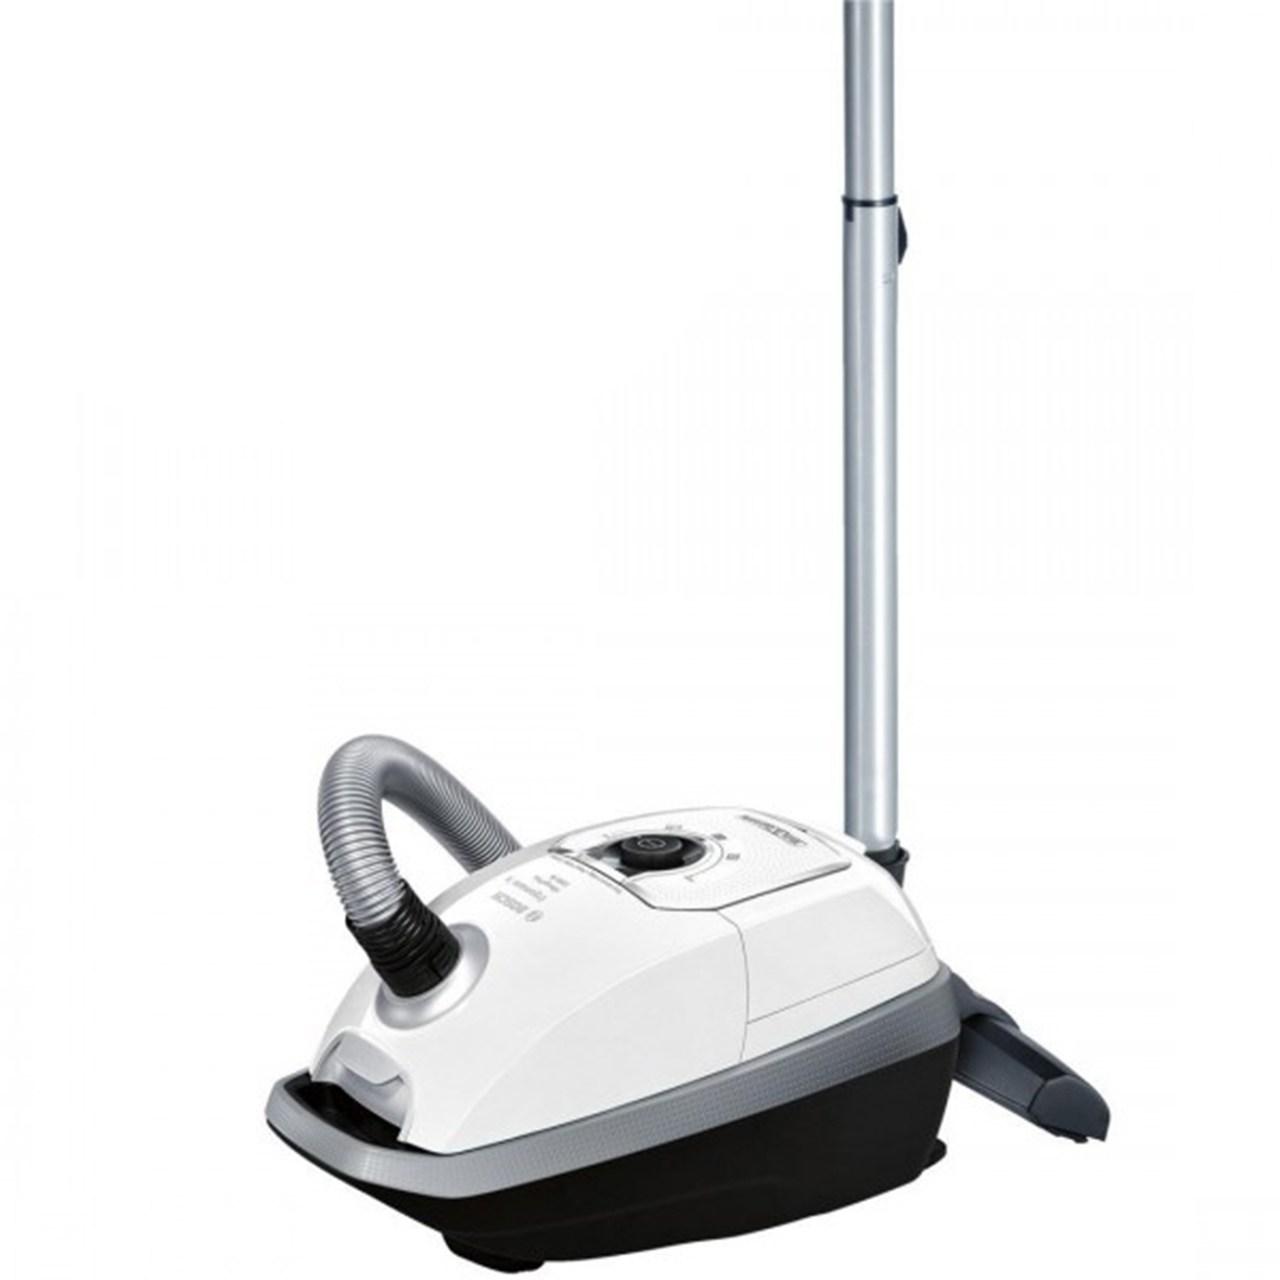 جاروبرقی بوش مدل BGL72234 | Bosch BGL72234 Vacuum Cleaner